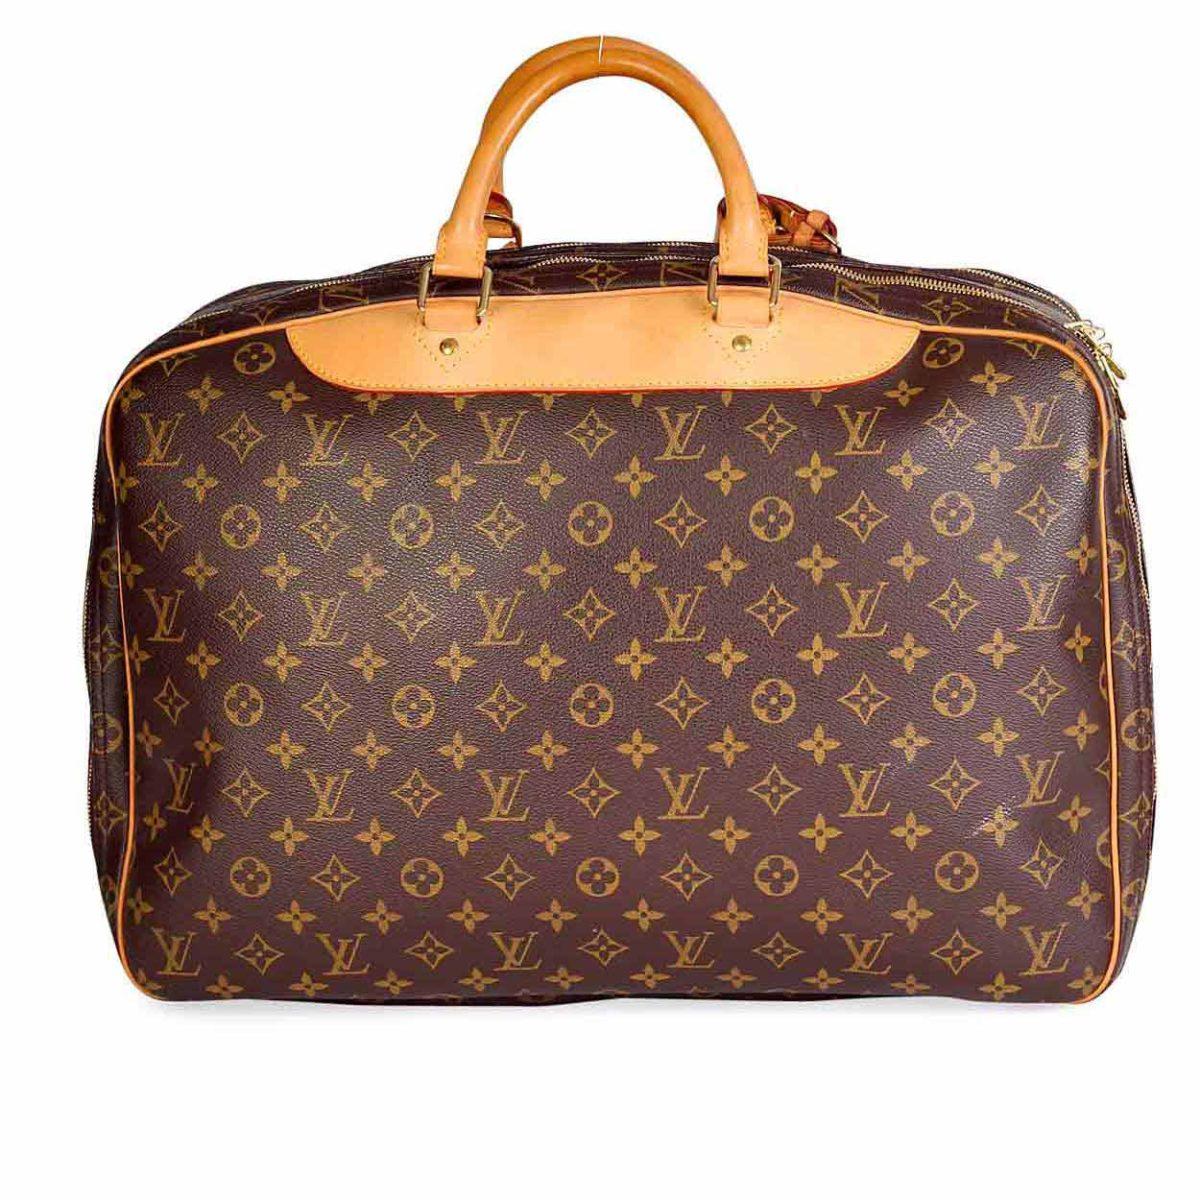 louis vuitton monogram vintage alize 2 poches travel bag luxity. Black Bedroom Furniture Sets. Home Design Ideas